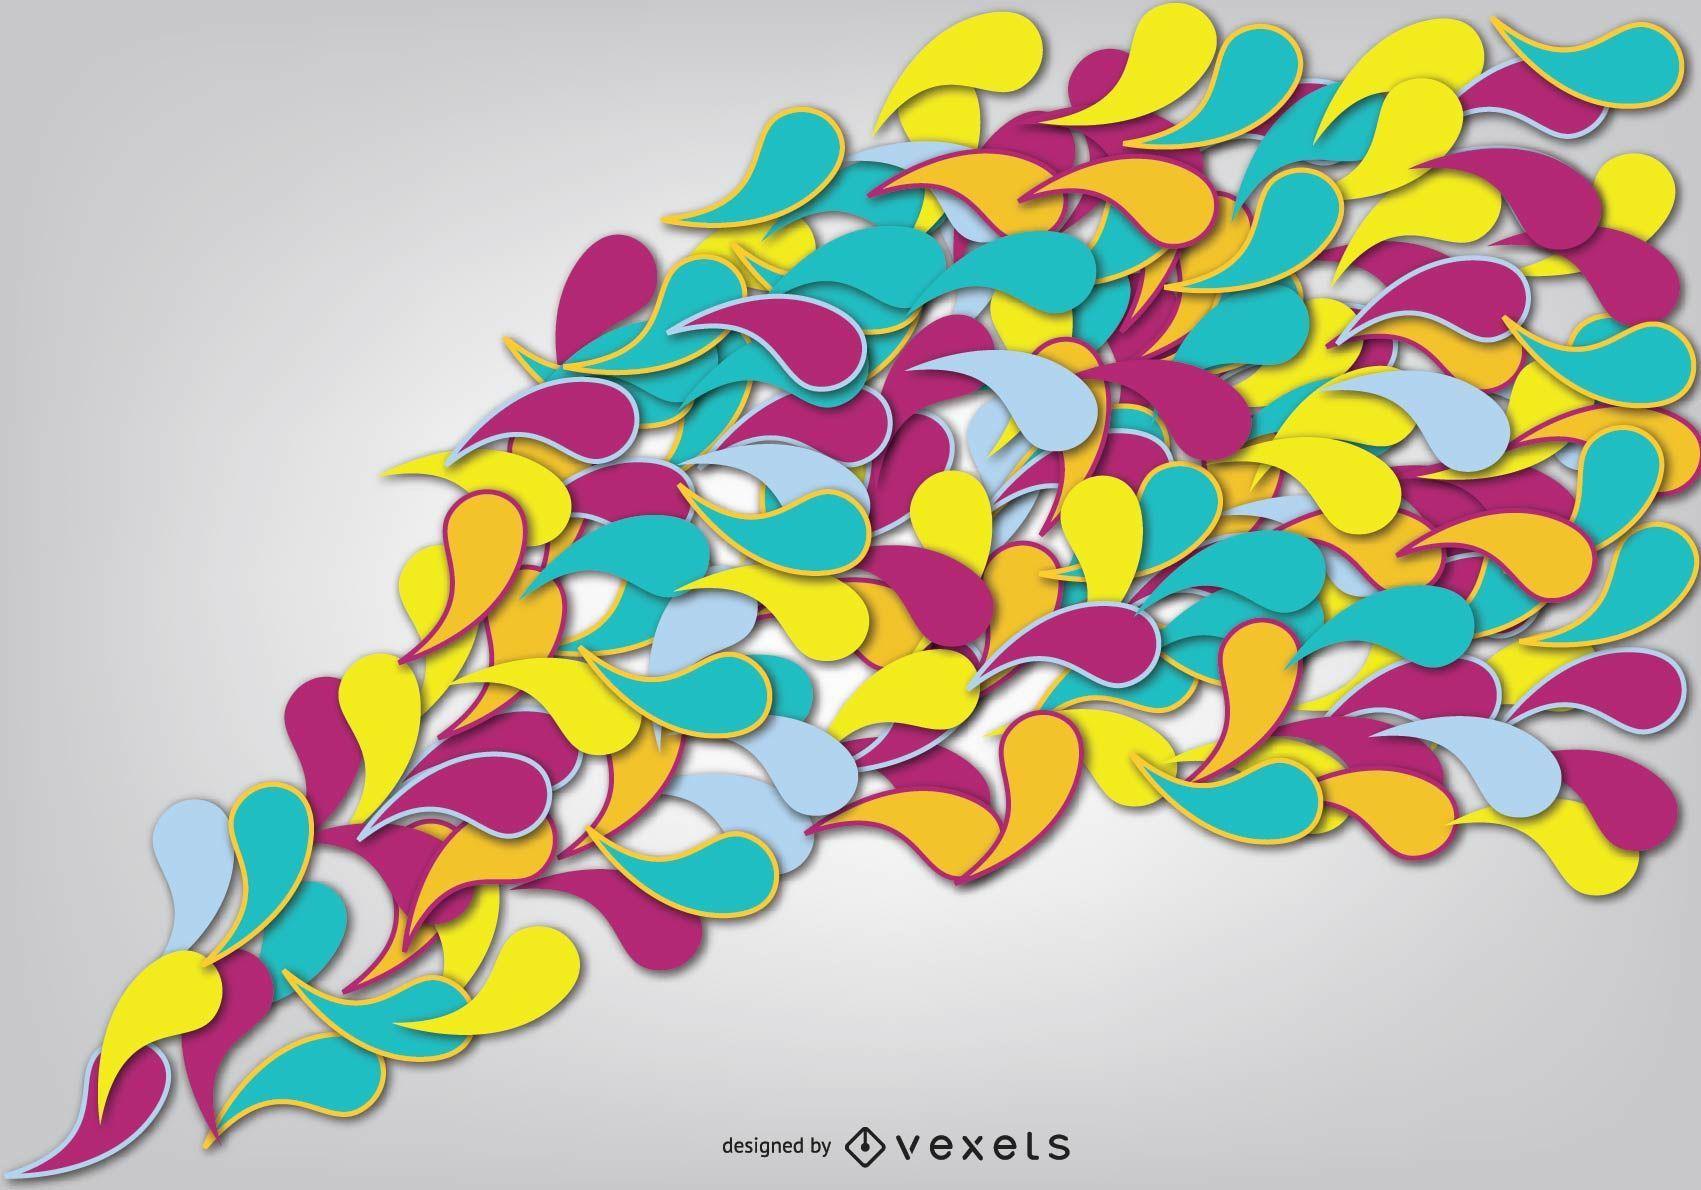 Flowing Multicolored Swirls Background